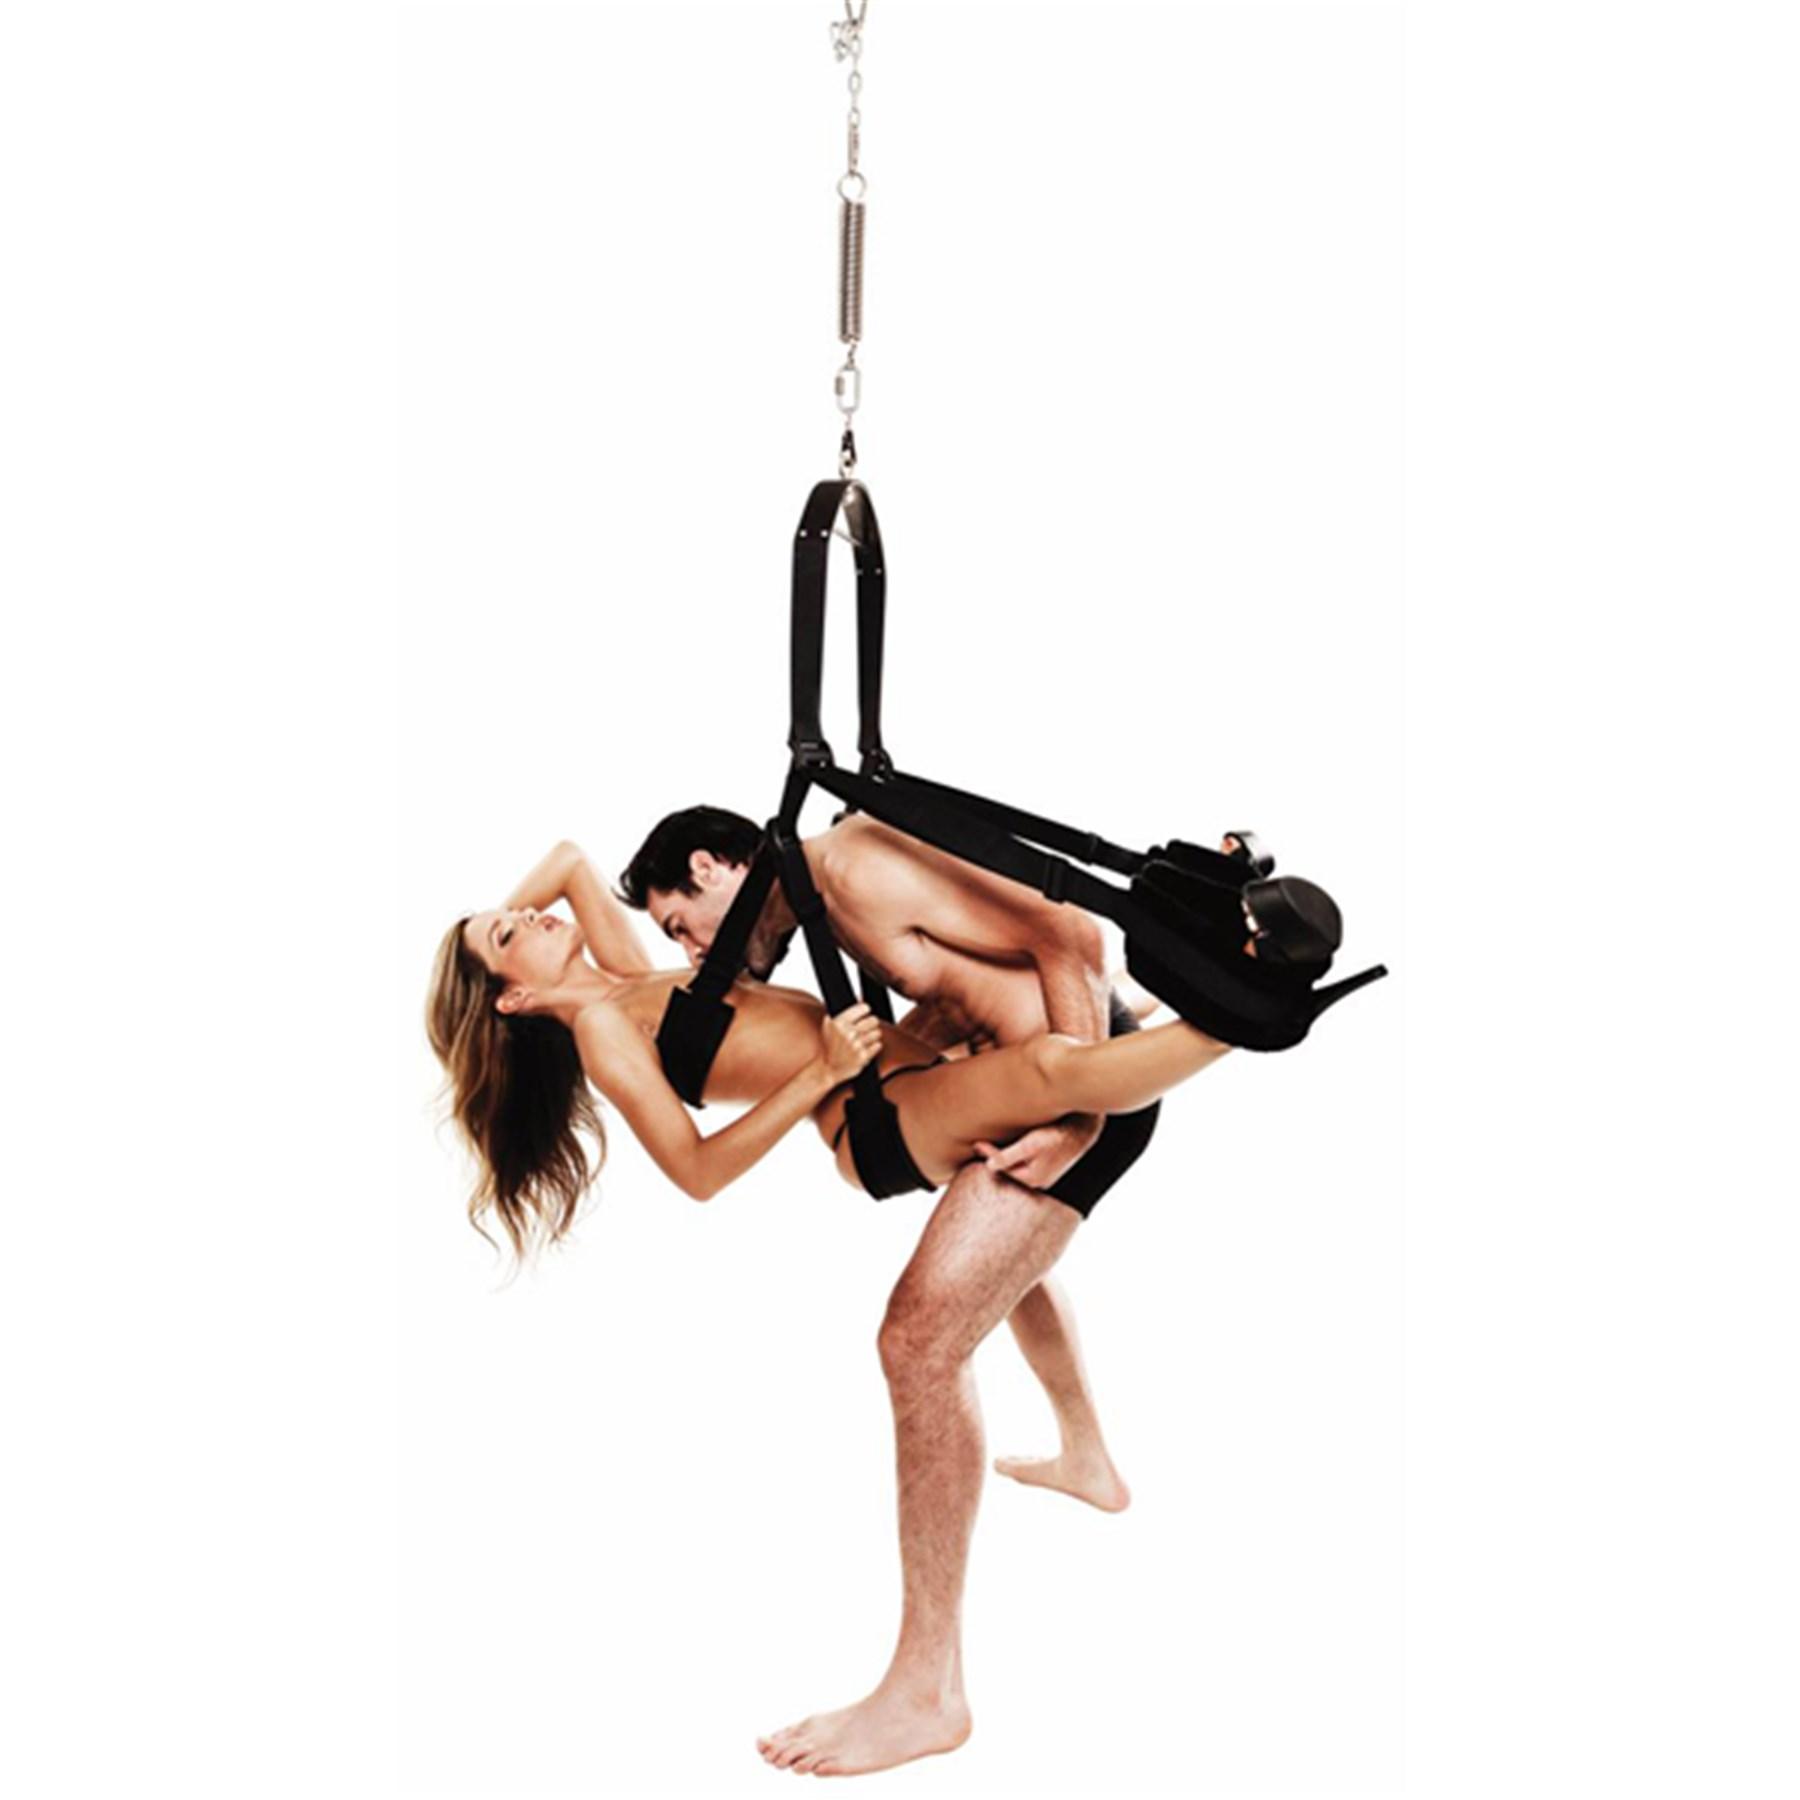 Spinning sukupuoli swing video-7882